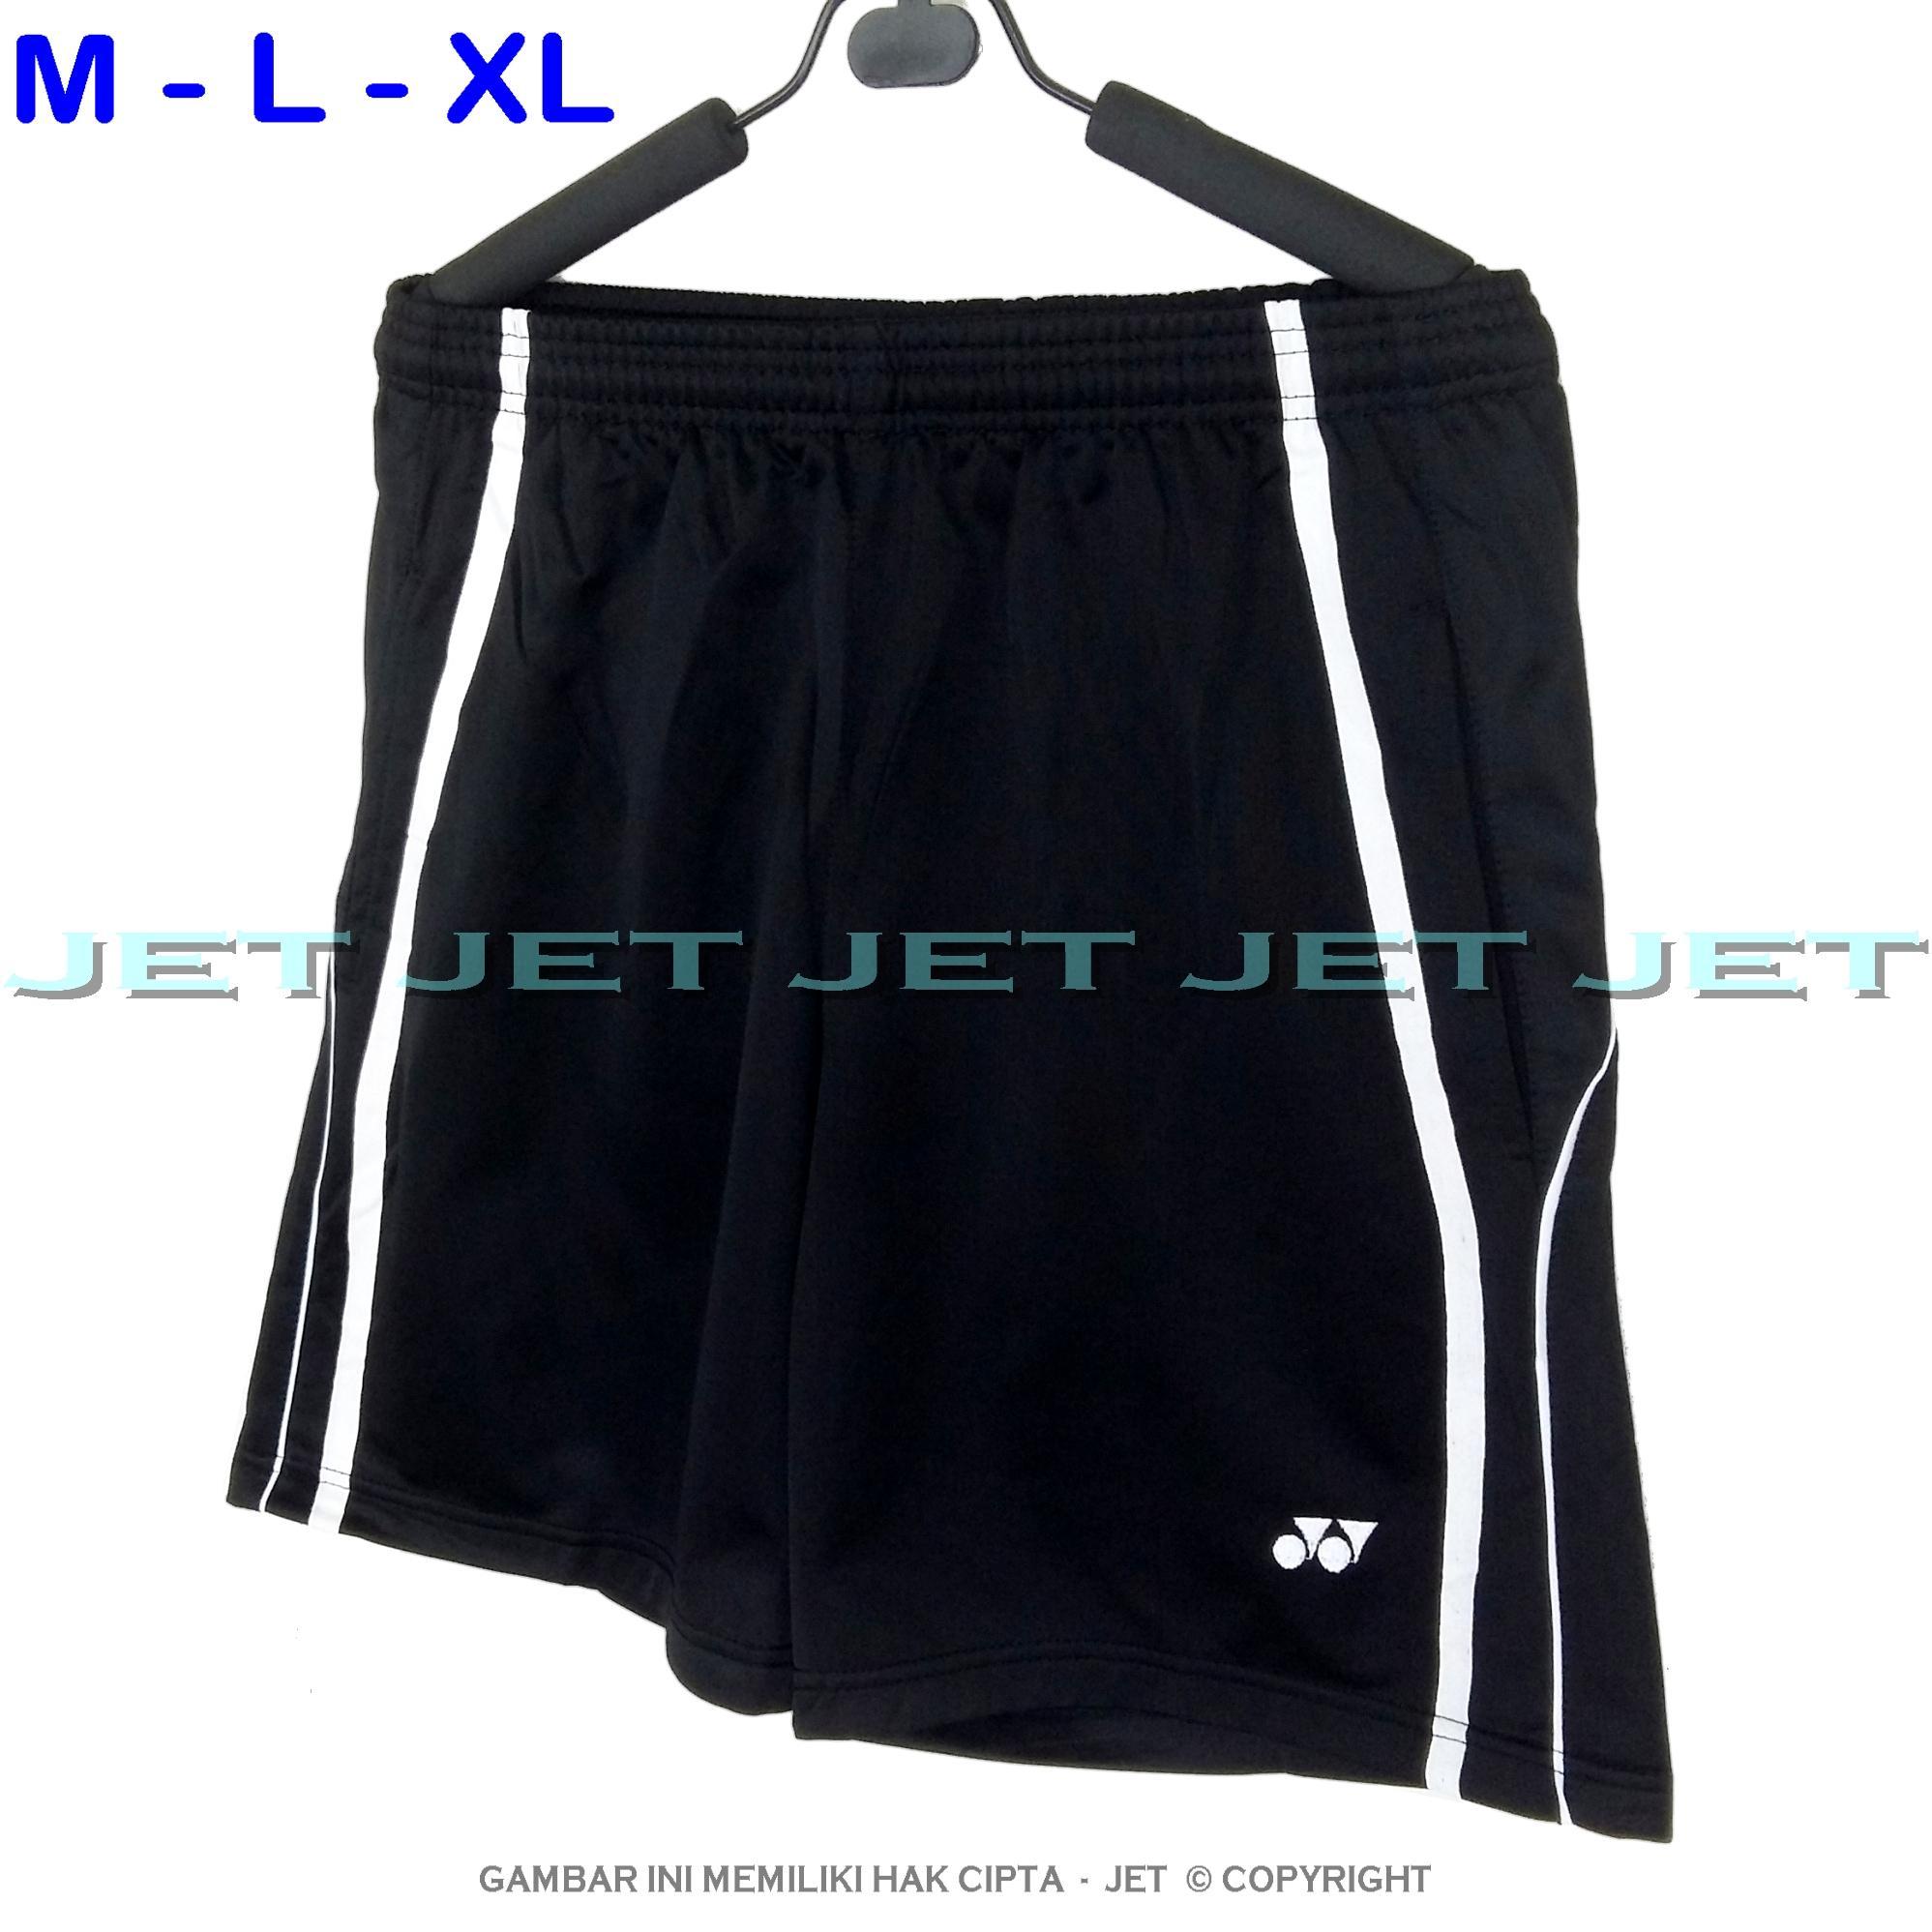 baju-jersey-kaos-bola-pakaian-olahraga-atasan-pria-atasan-wanita-baju-futsal-voli-sepak-bola-tennis-running-sepeda-bulutangkis-baju-bola-training-t-shirt-murah-olah-raga-all-sports-fashion-jersey-atasan-pria-wanita-cowo-cewe-casual-dri-fit-victor-1915-97631568-040e91f773040b8a6ac2f7cff222ee94-catalog_233 Daftar Harga Pakaian Voli Termurah Maret 2019